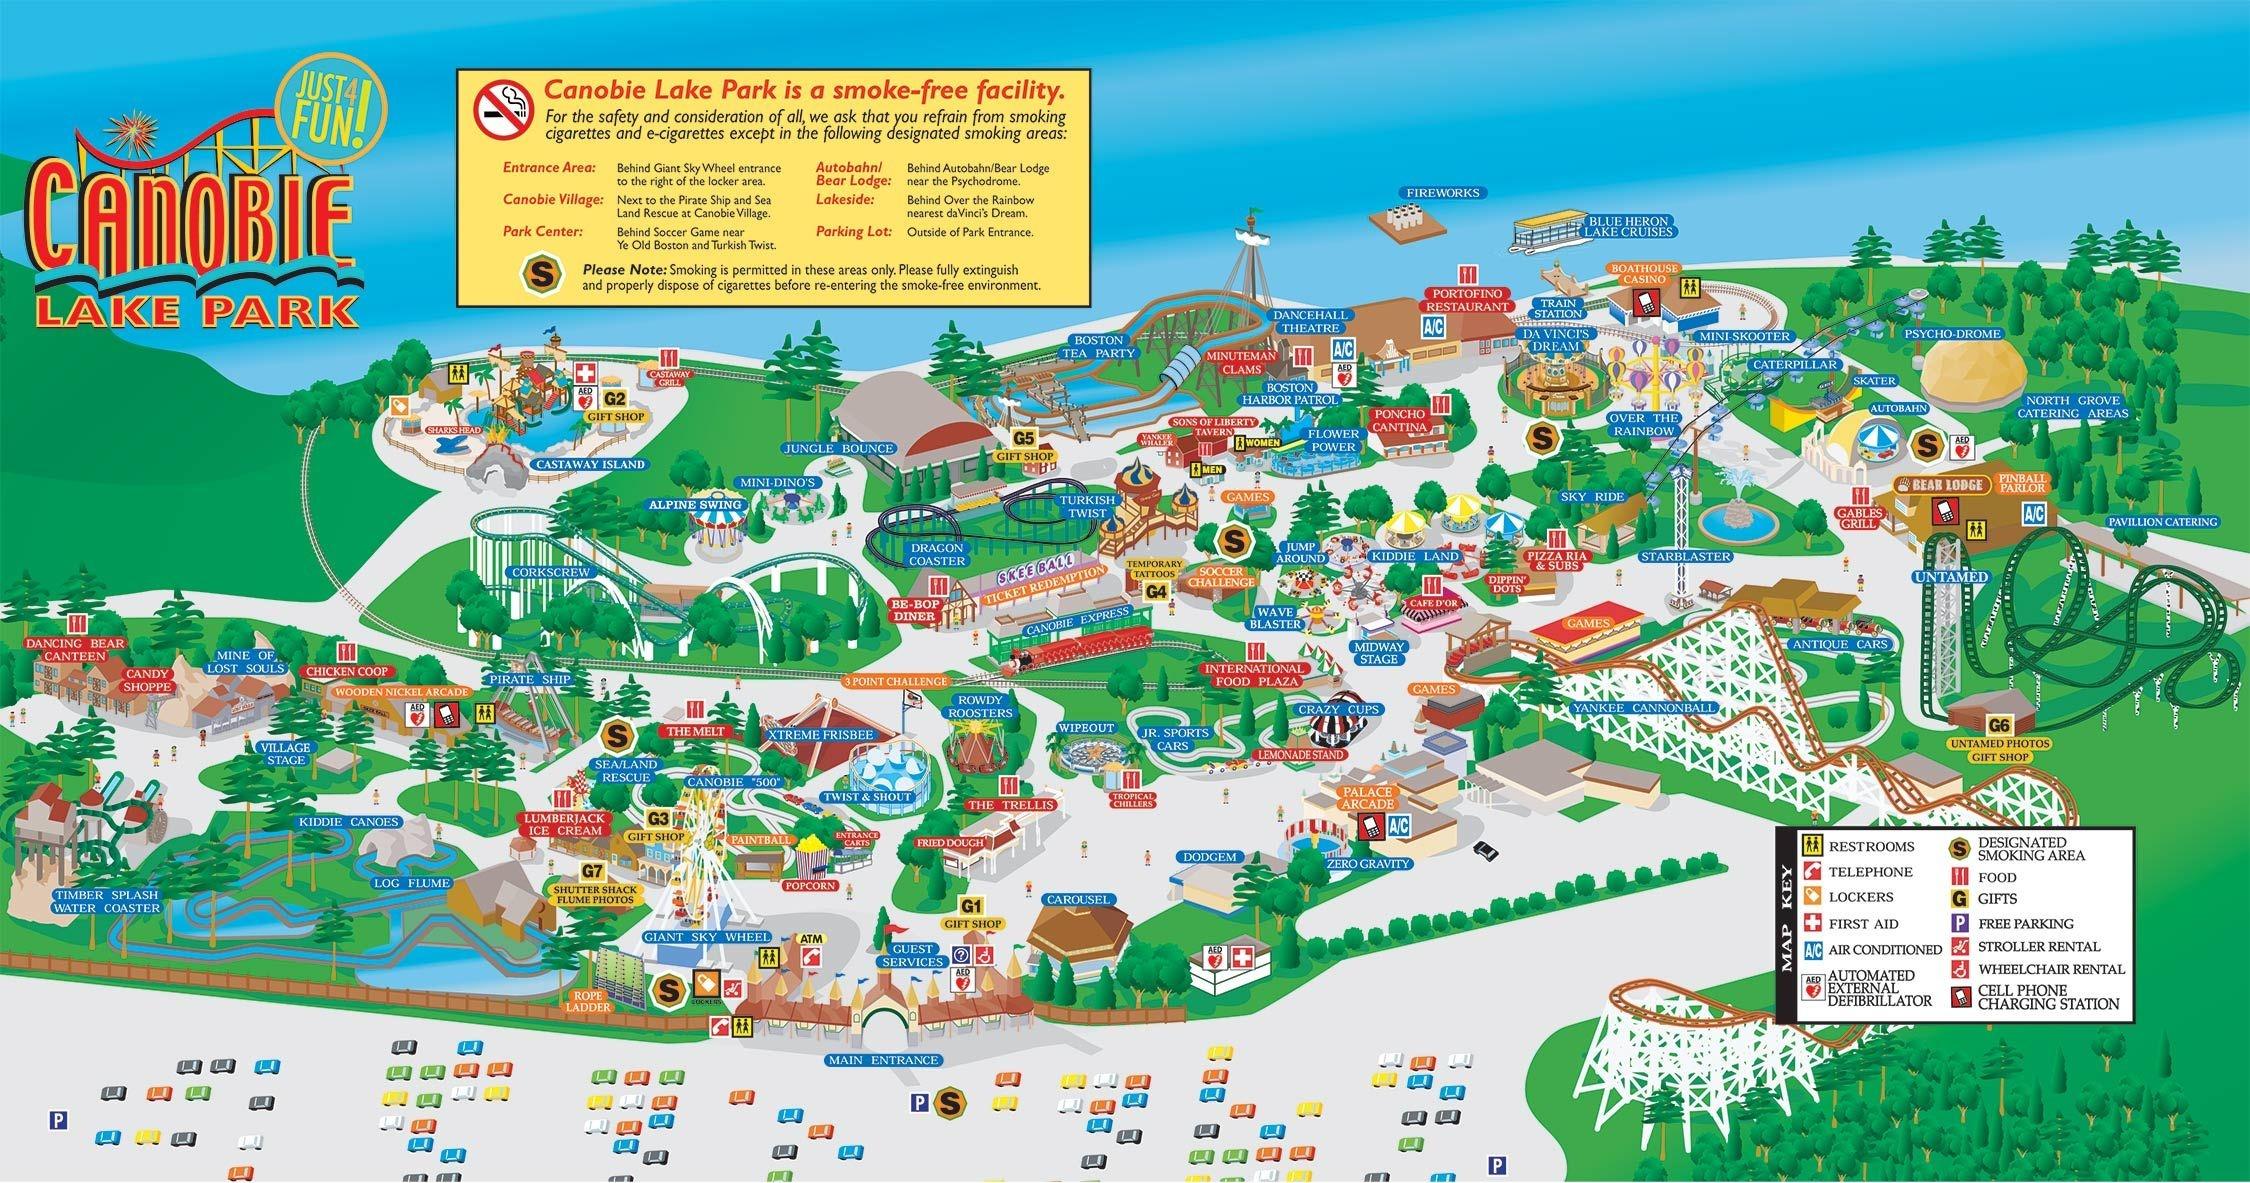 Park Map   Canobie Lake Park   Map In 2019   Canobie Lake Park, Park - Free Printable Coupons For Canobie Lake Park